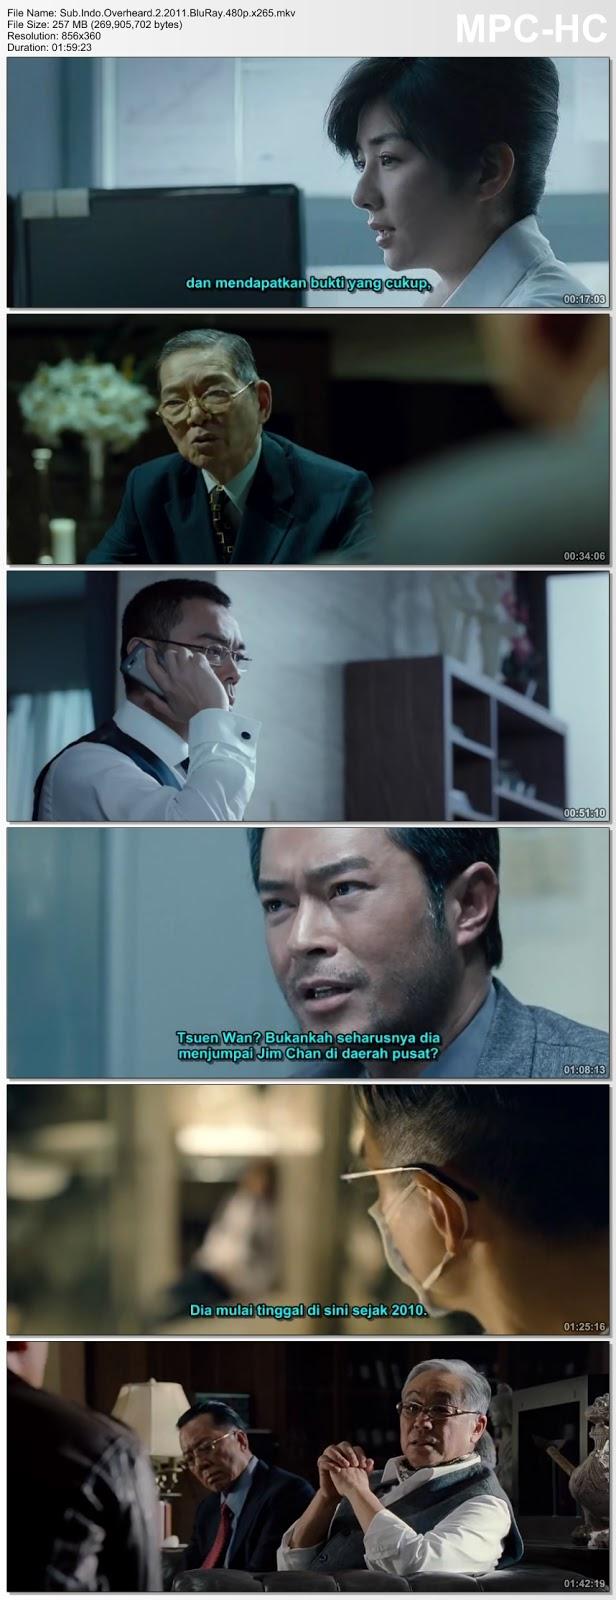 Screenshots Movie Sub.Indo.Sit ting fung wan 2 aka Overheard 2 (2011).BluRay.480p.x265.mkv